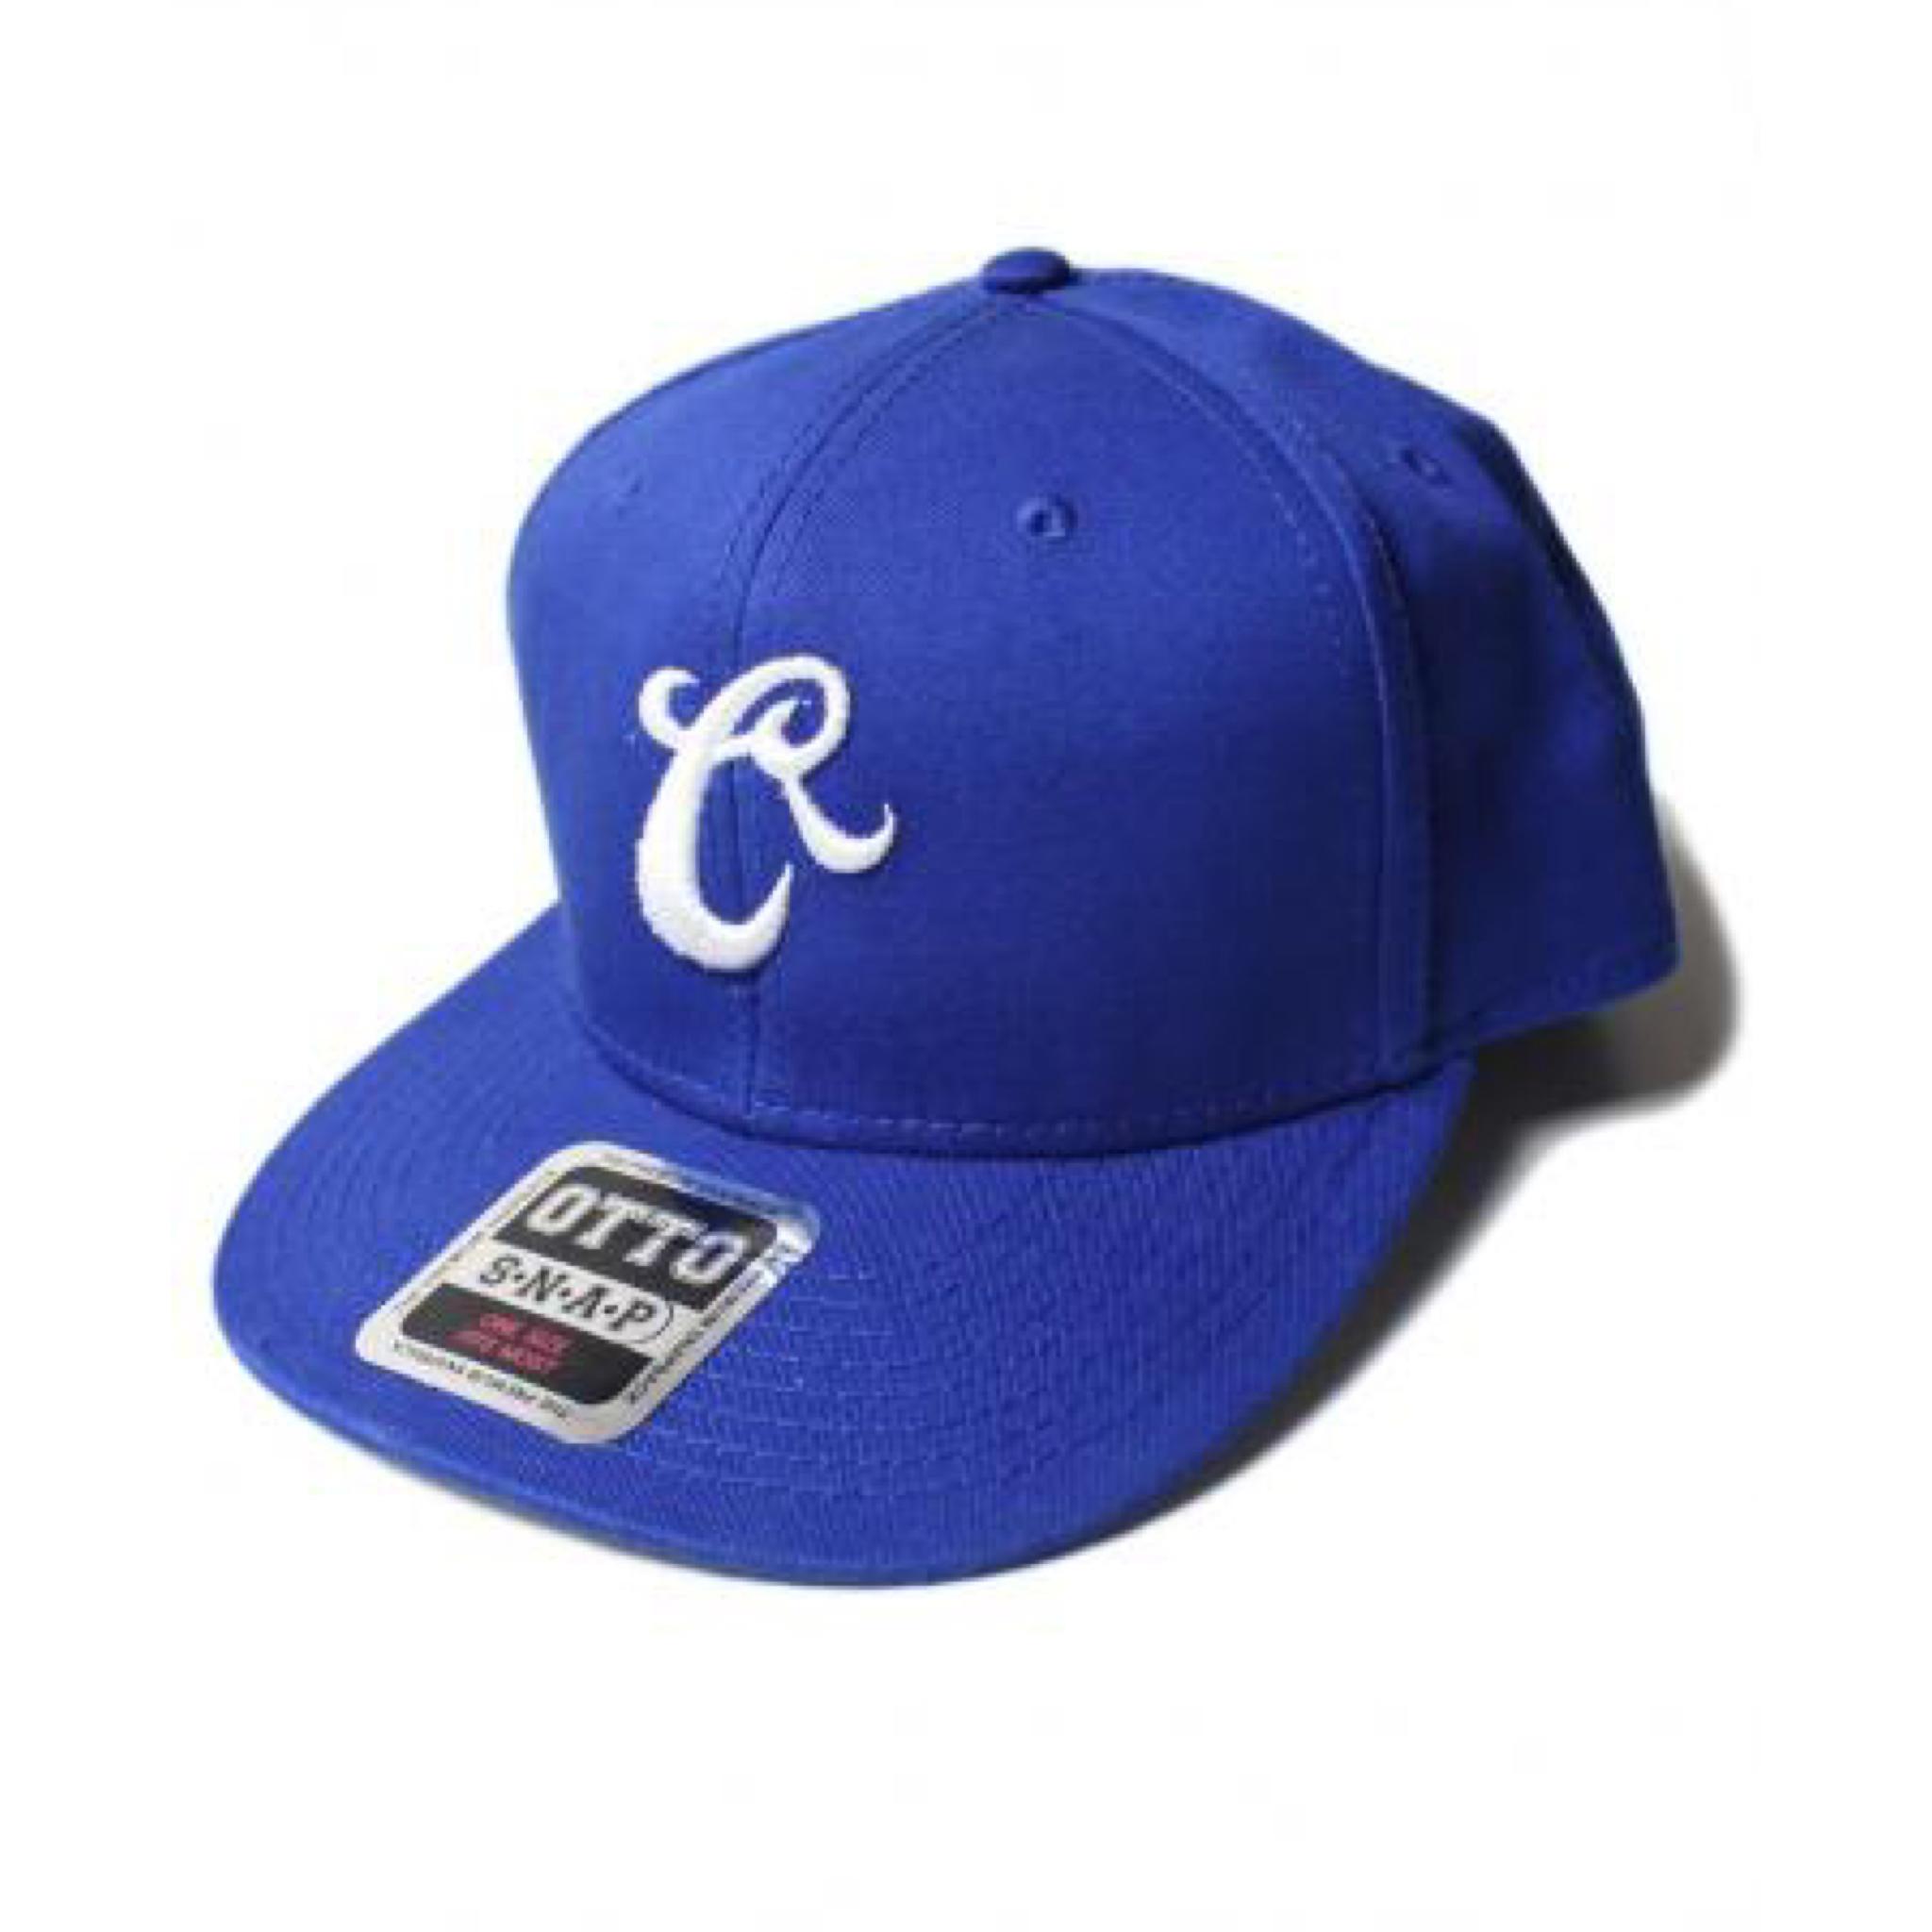 RUTHLESS #B Cotton Cap Blue